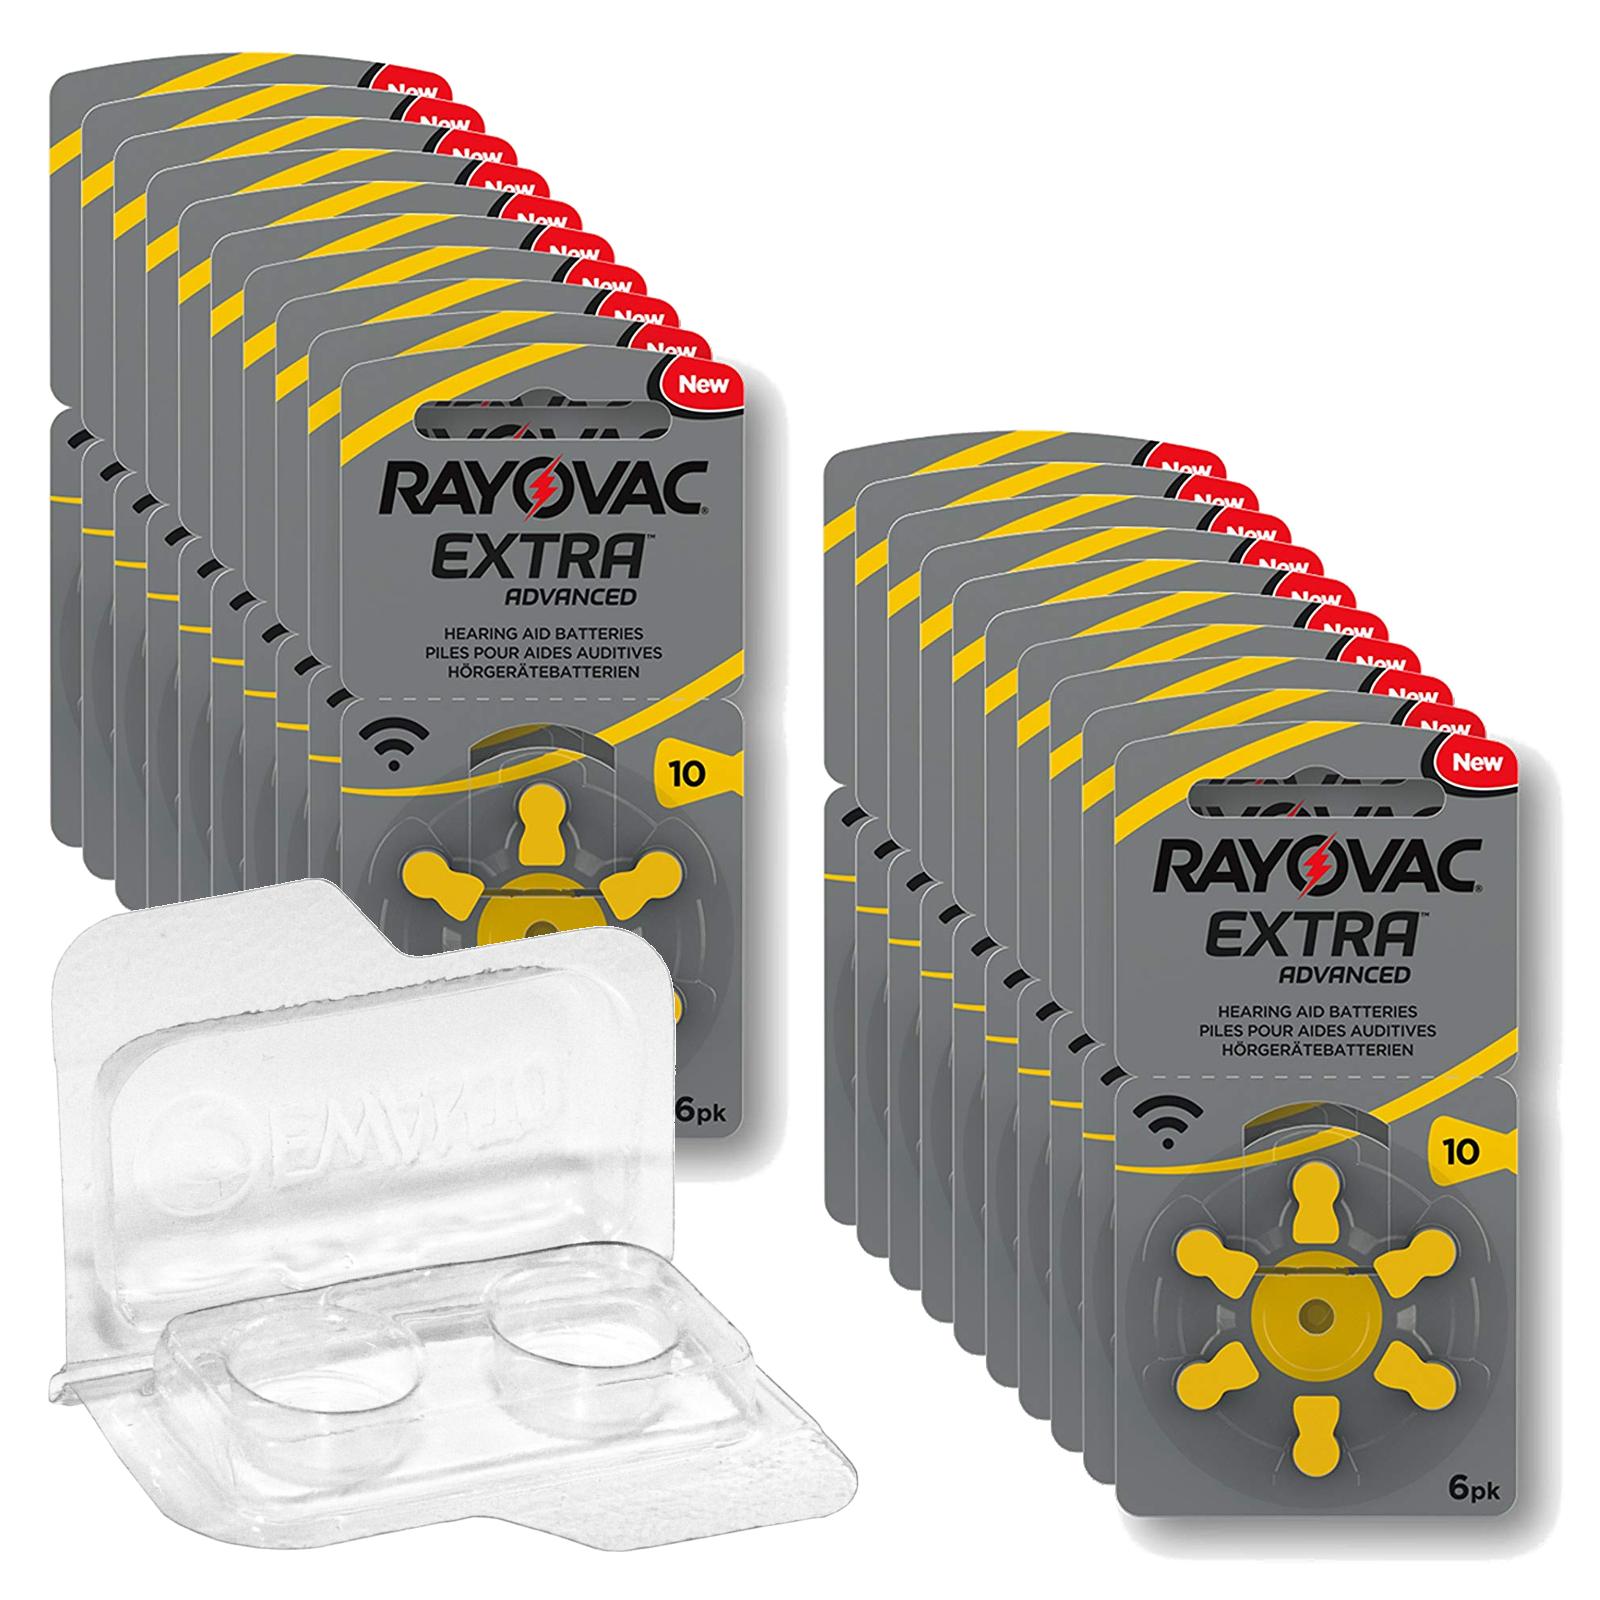 120 Rayovac Extra Advanced Hörgerätebatterien PR70 gelb 10  + Box f. 2 Zellen